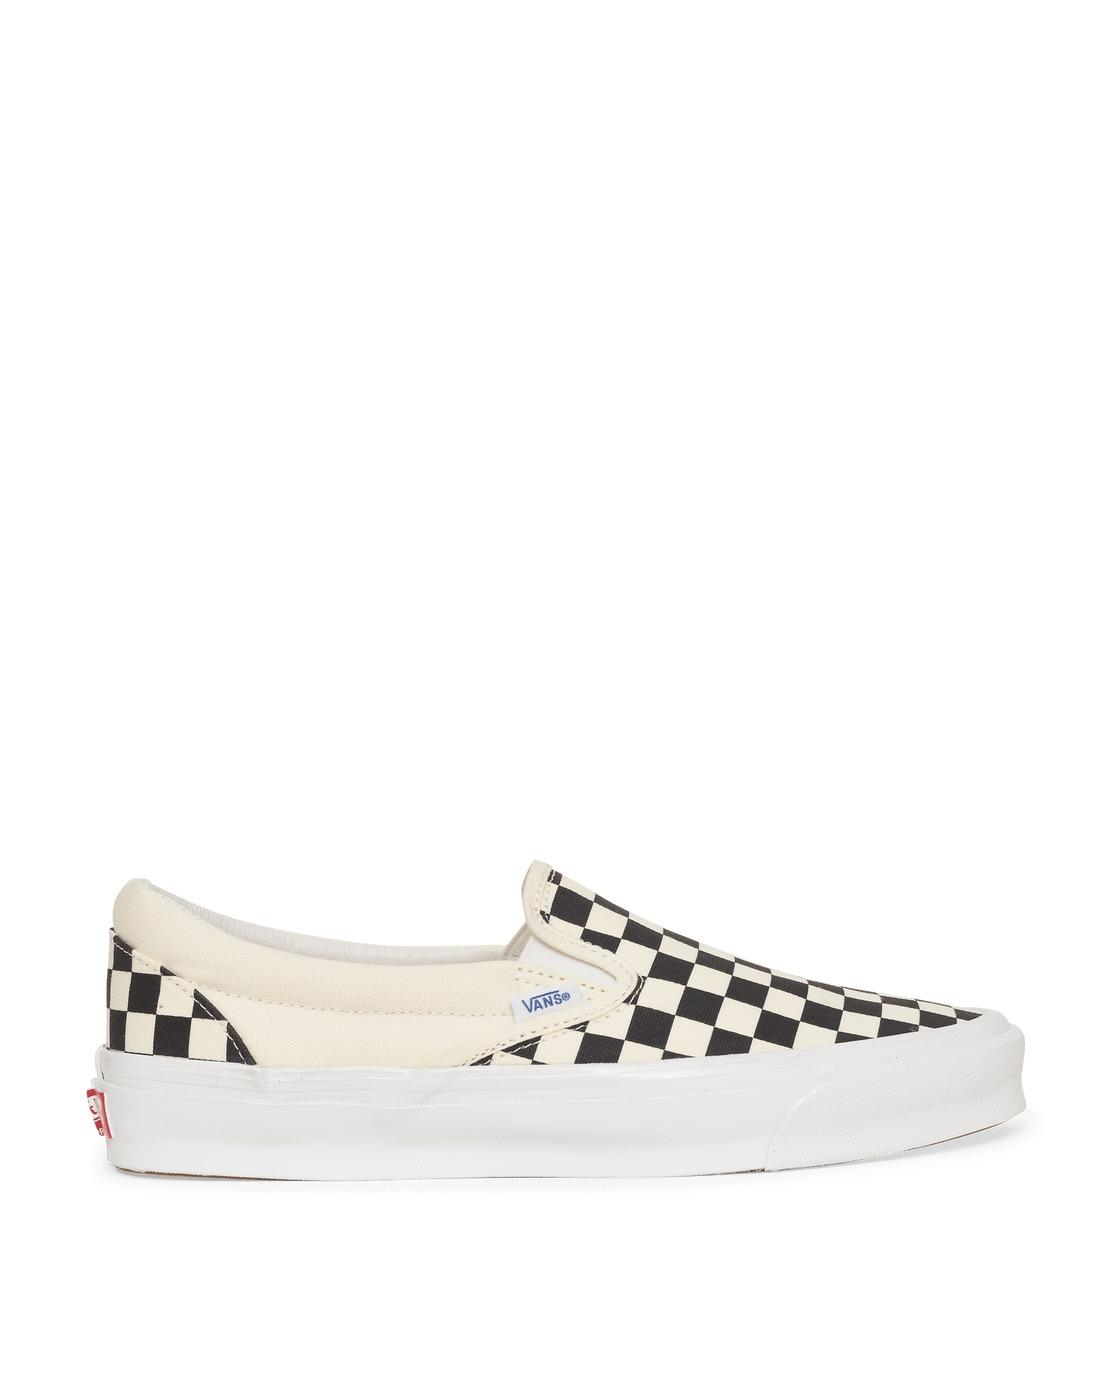 Photo: Vans Og Classic Slip On Lx Sneakers Checkerboard